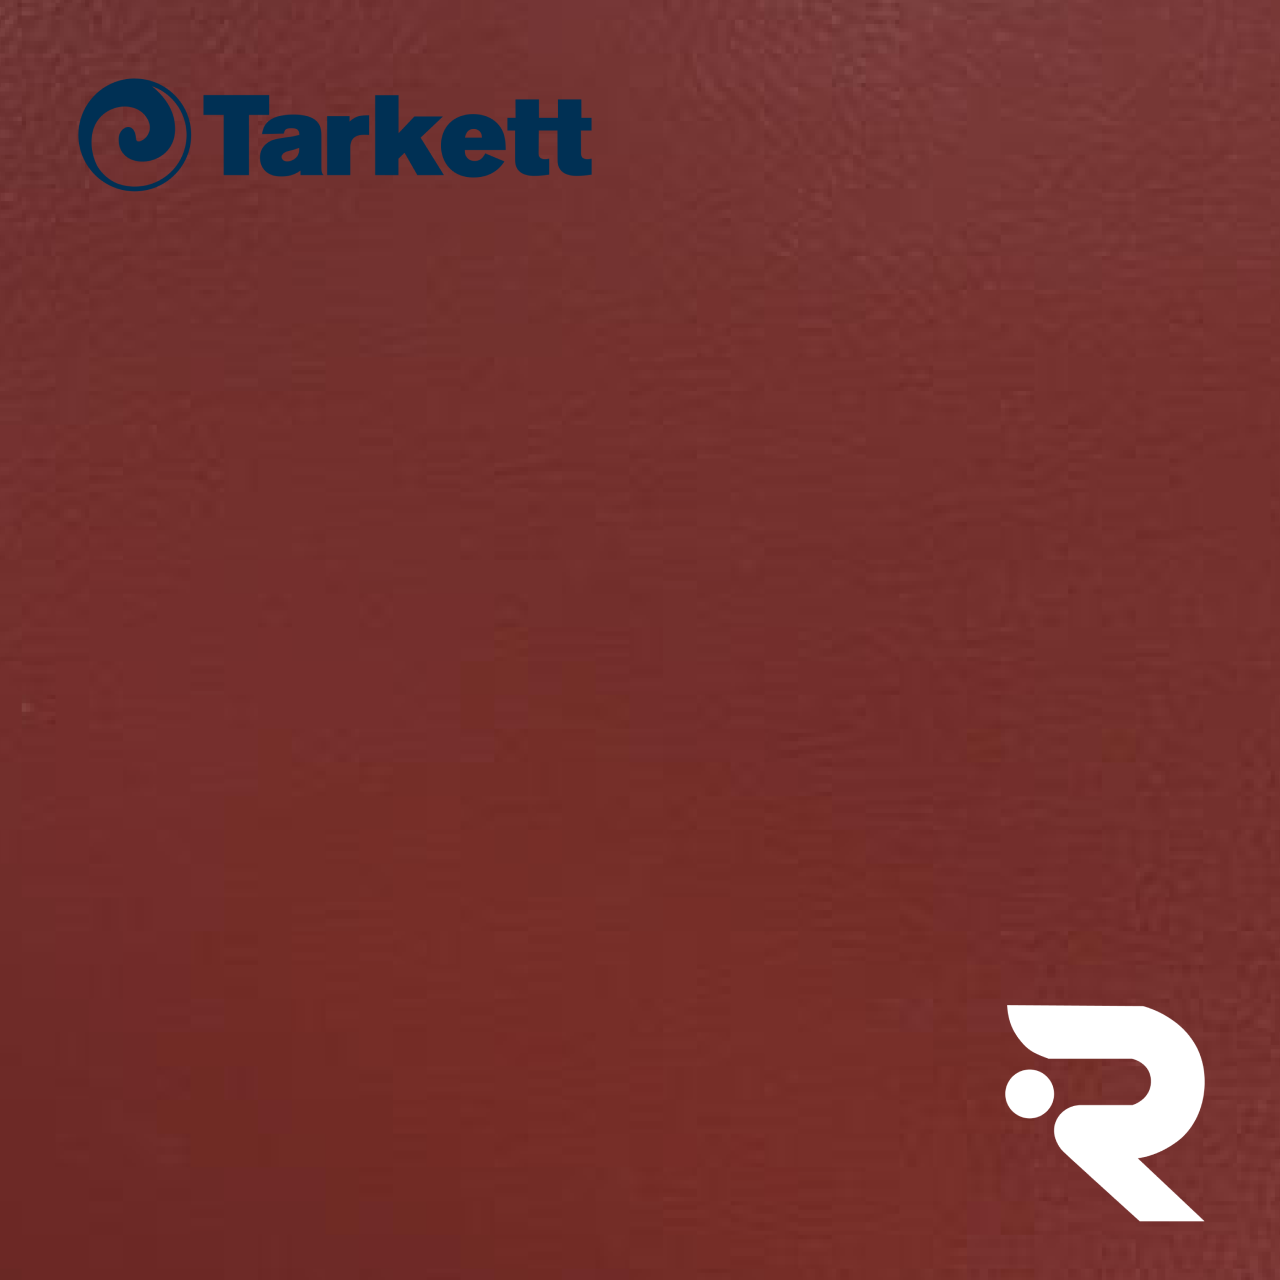 🏐 Спортивне покриття Tarkett   RED   OMNISPORTS V35   2 х 20.5 м